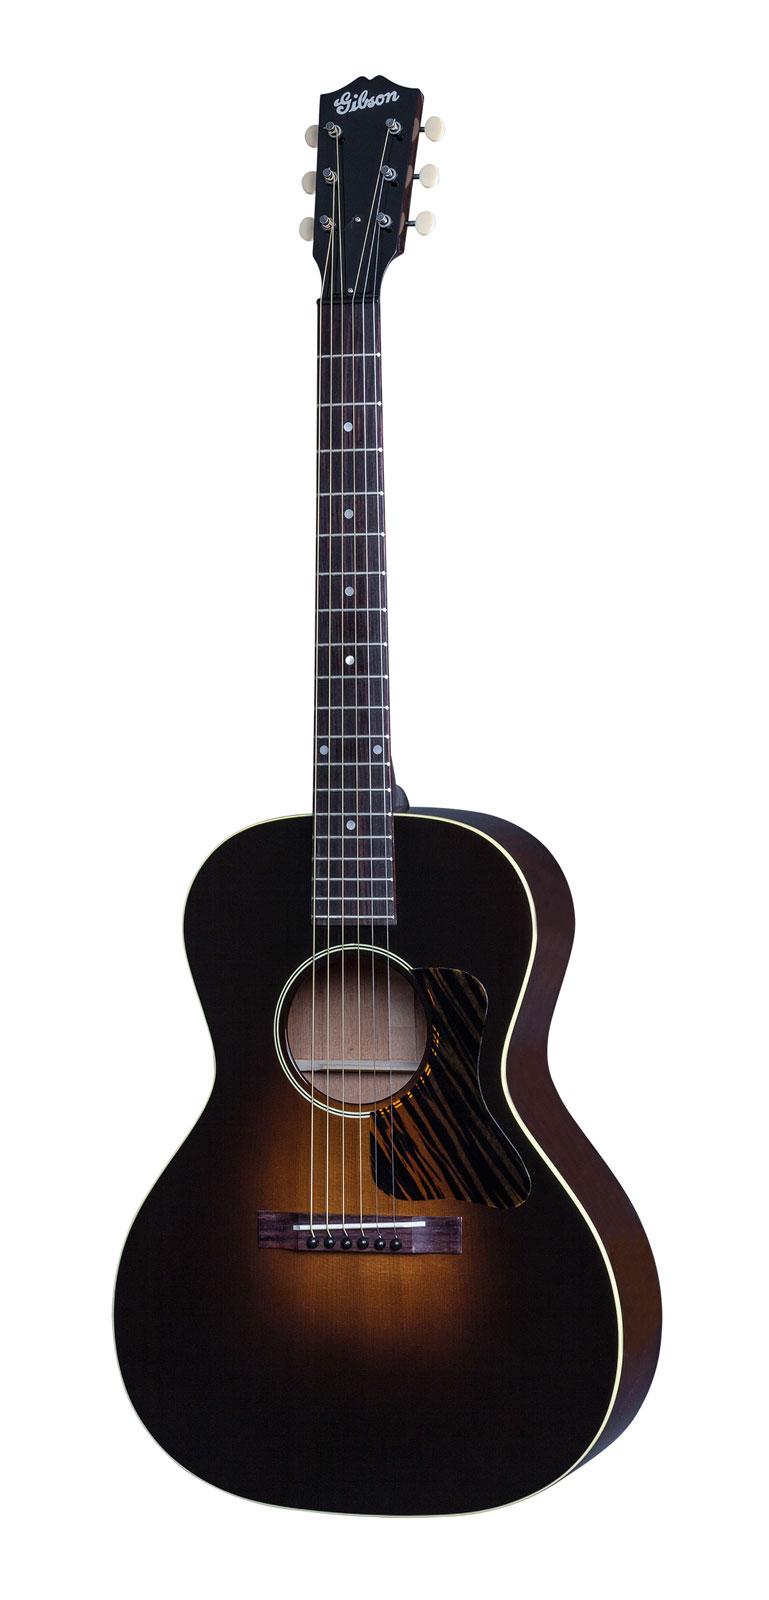 Guitare Gibson Catalogue Gibson France, Achat / vente